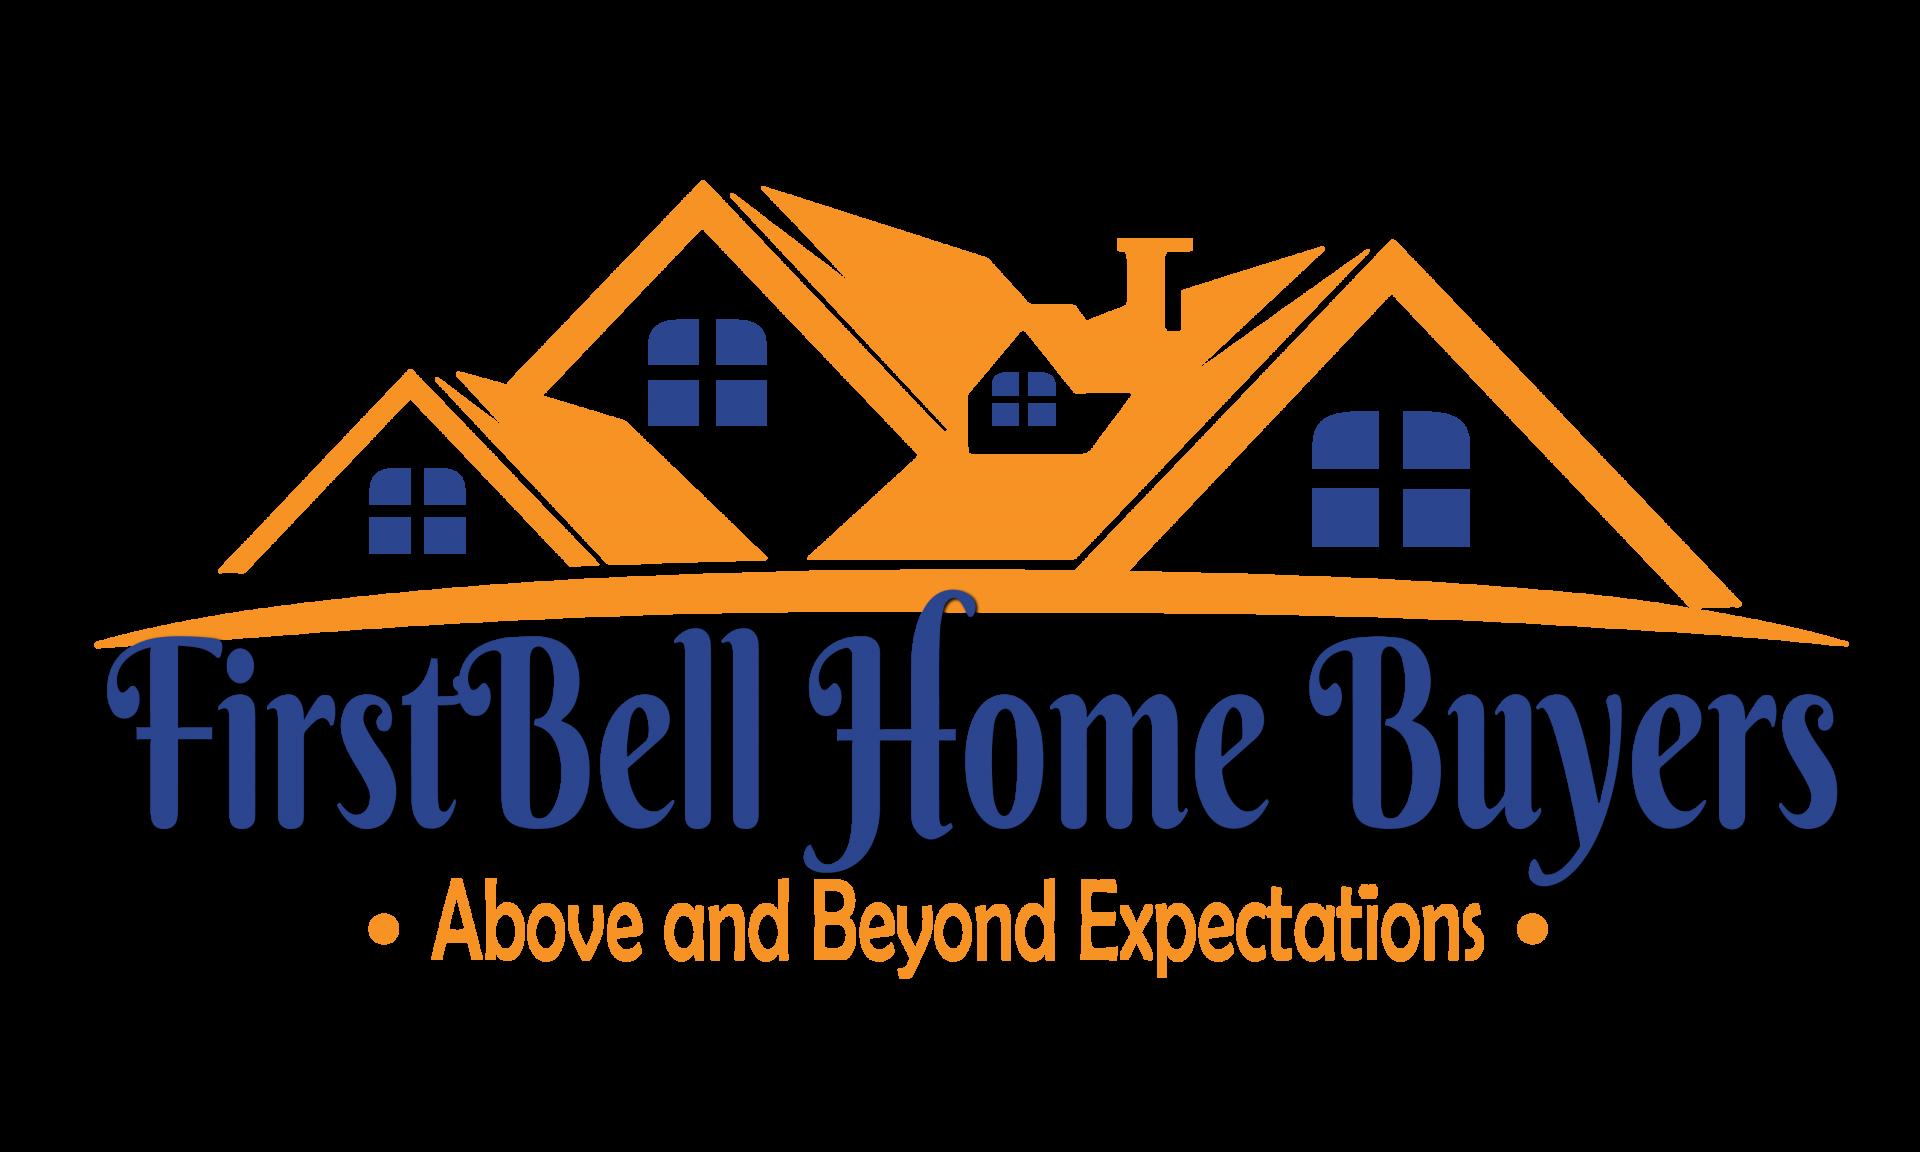 FirstBell Home Buyers logo